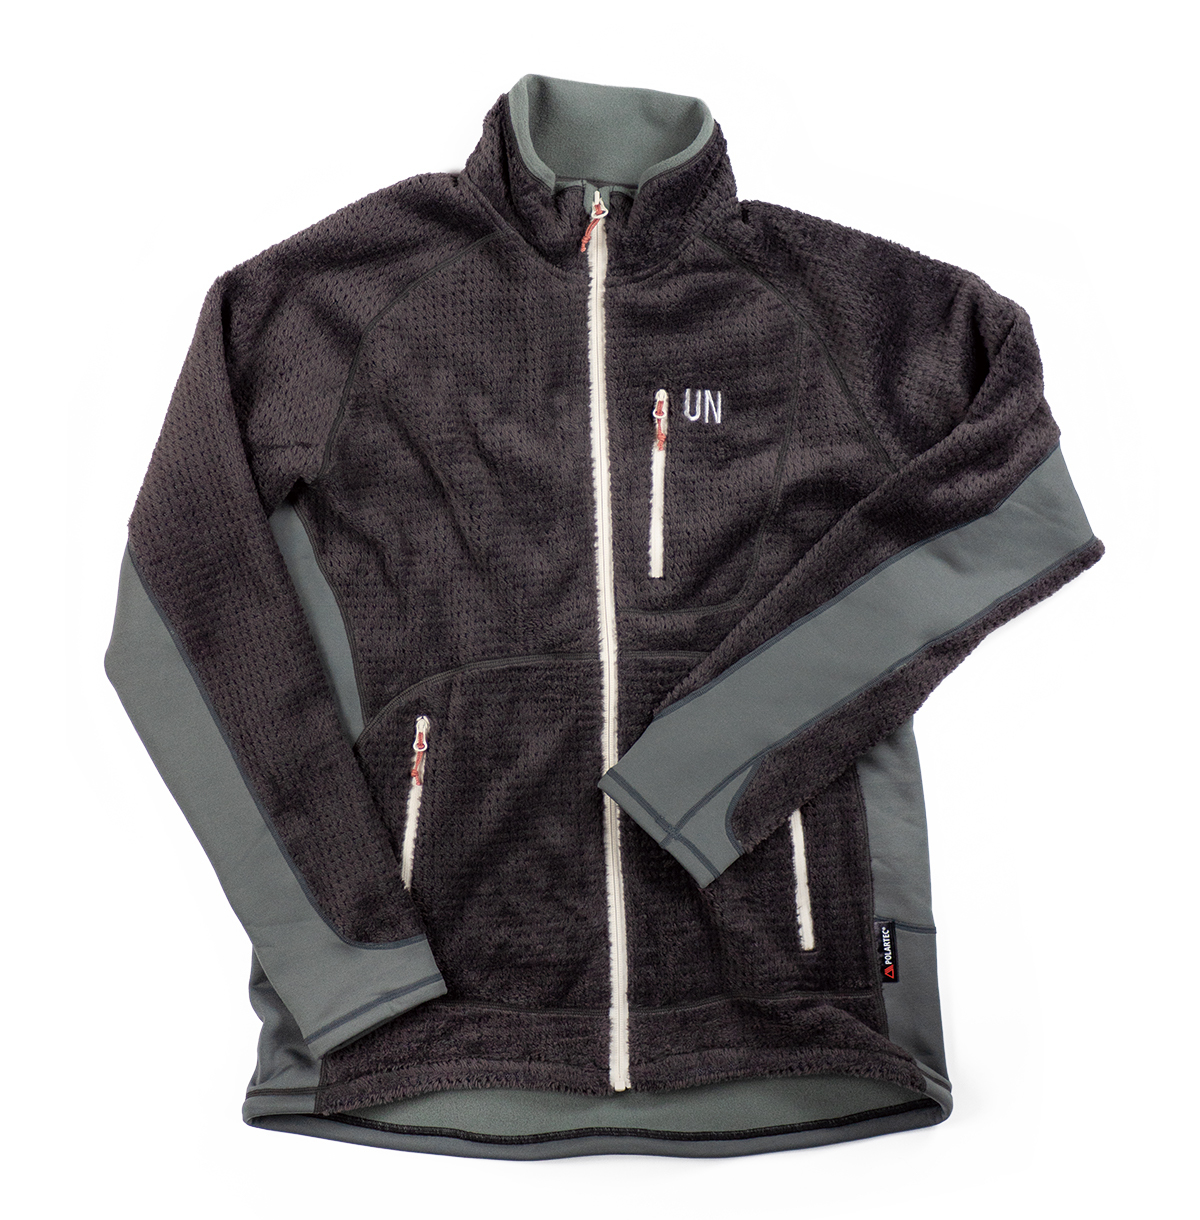 UN3400 High Loft fleece jacket / Charcoal